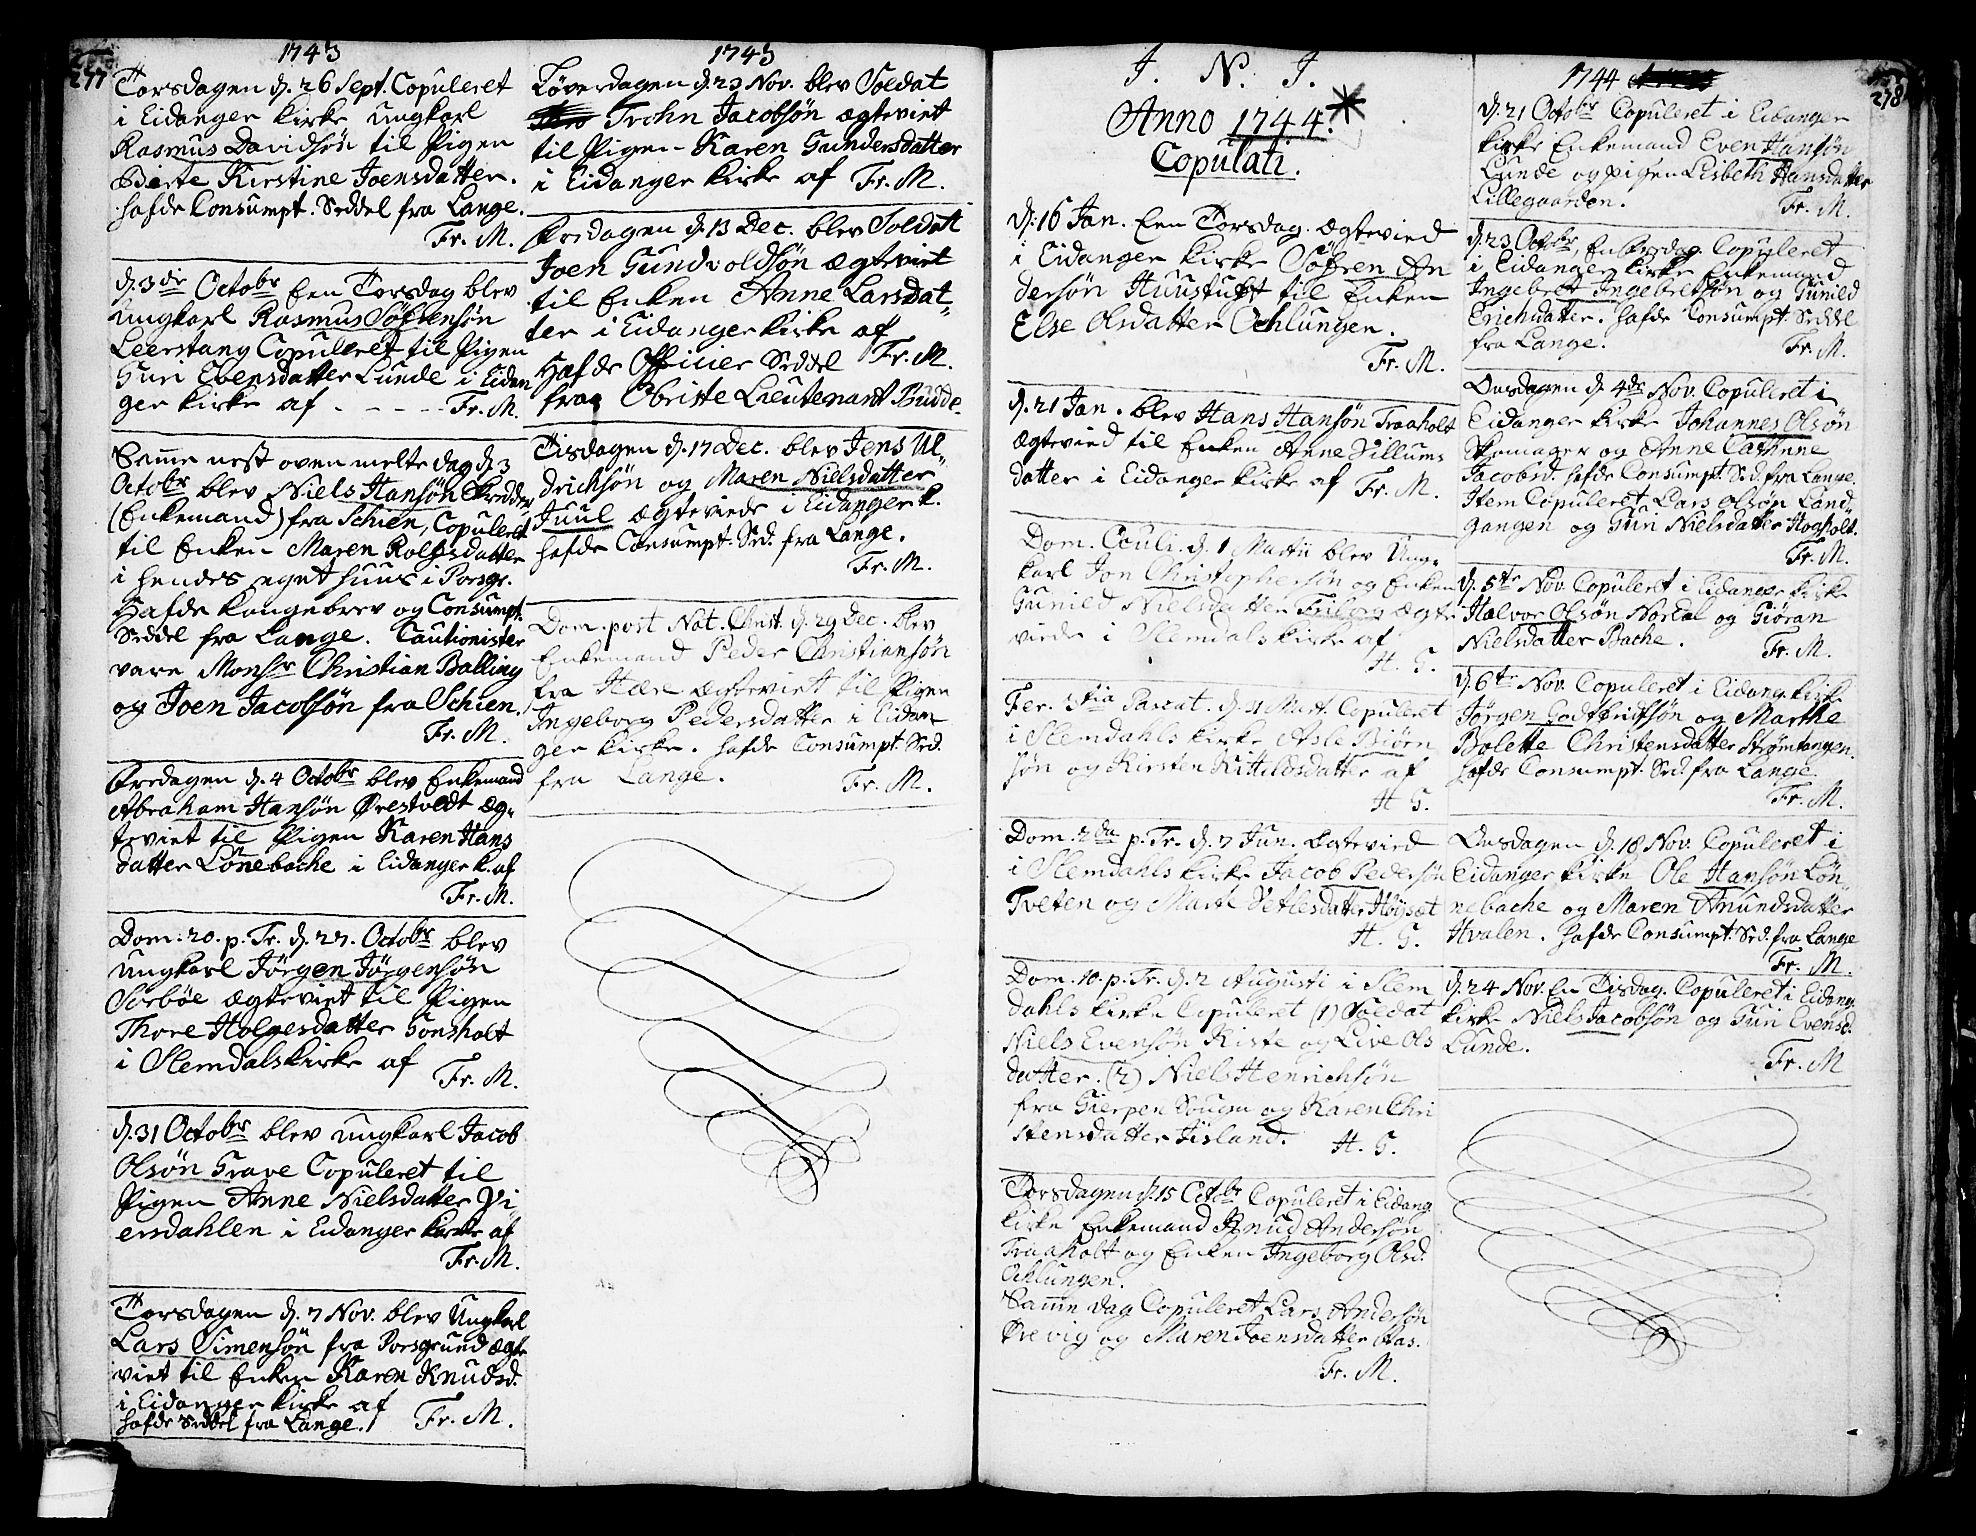 SAKO, Eidanger kirkebøker, F/Fa/L0004: Parish register (official) no. 4, 1733-1759, p. 277-278